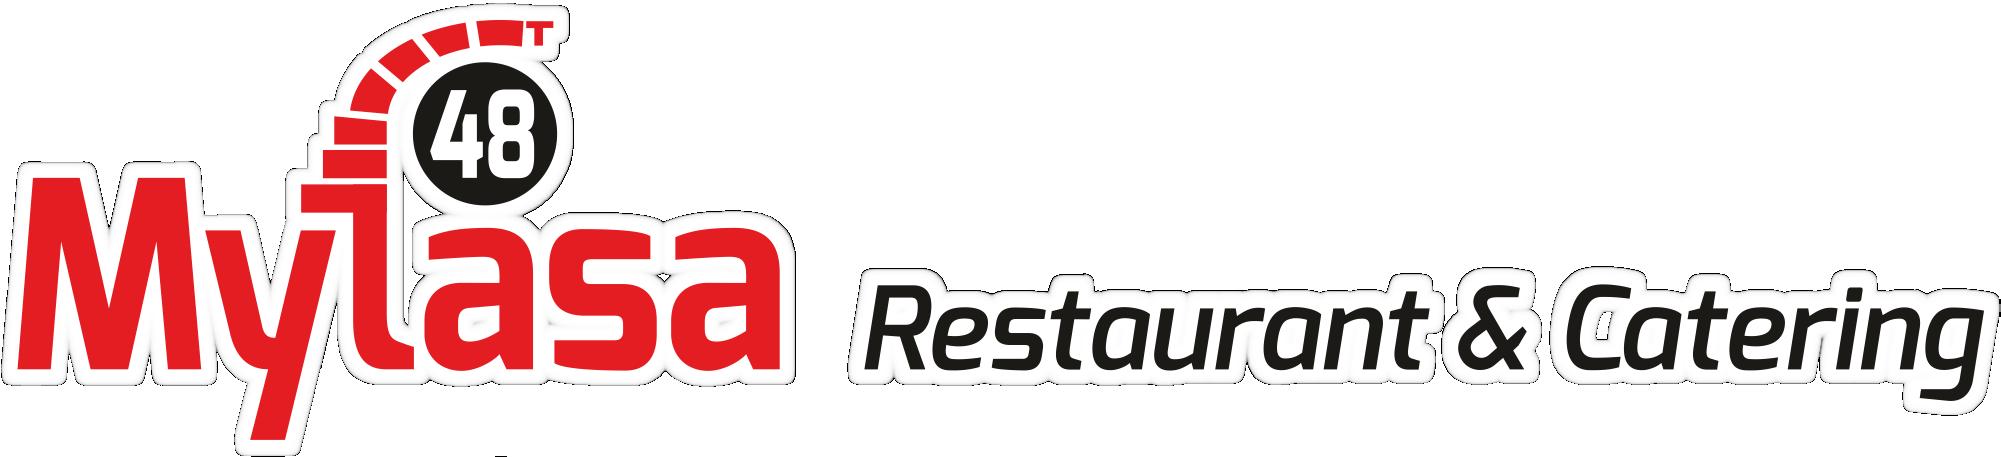 Mylasa48 Restaurant & Catering